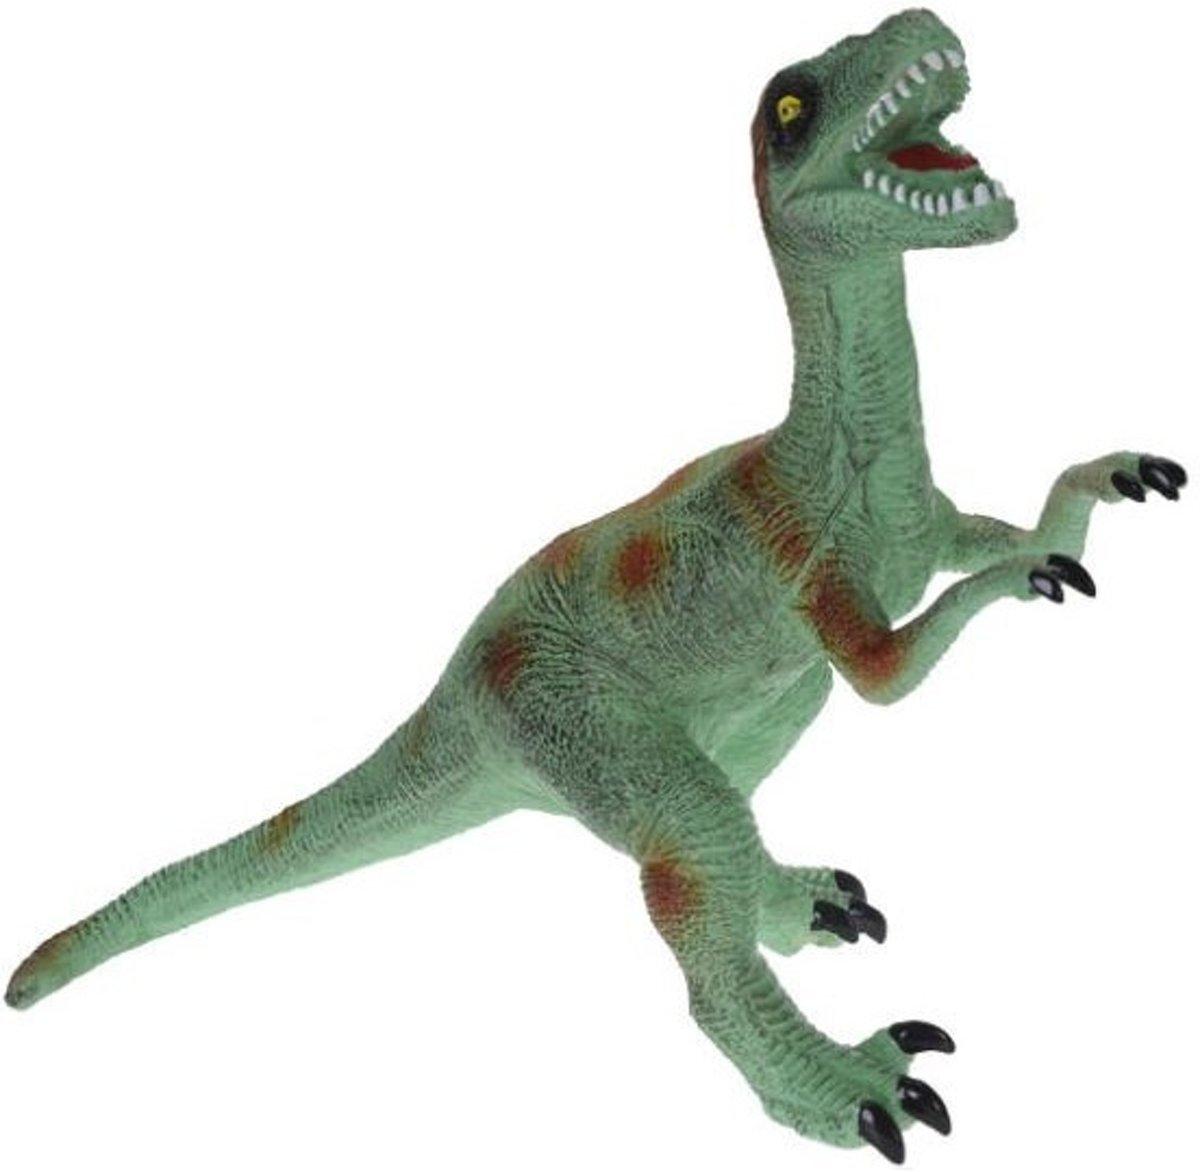 Tender Toys Dinosaurus T-rex 55 Cm Groen/oranje kopen